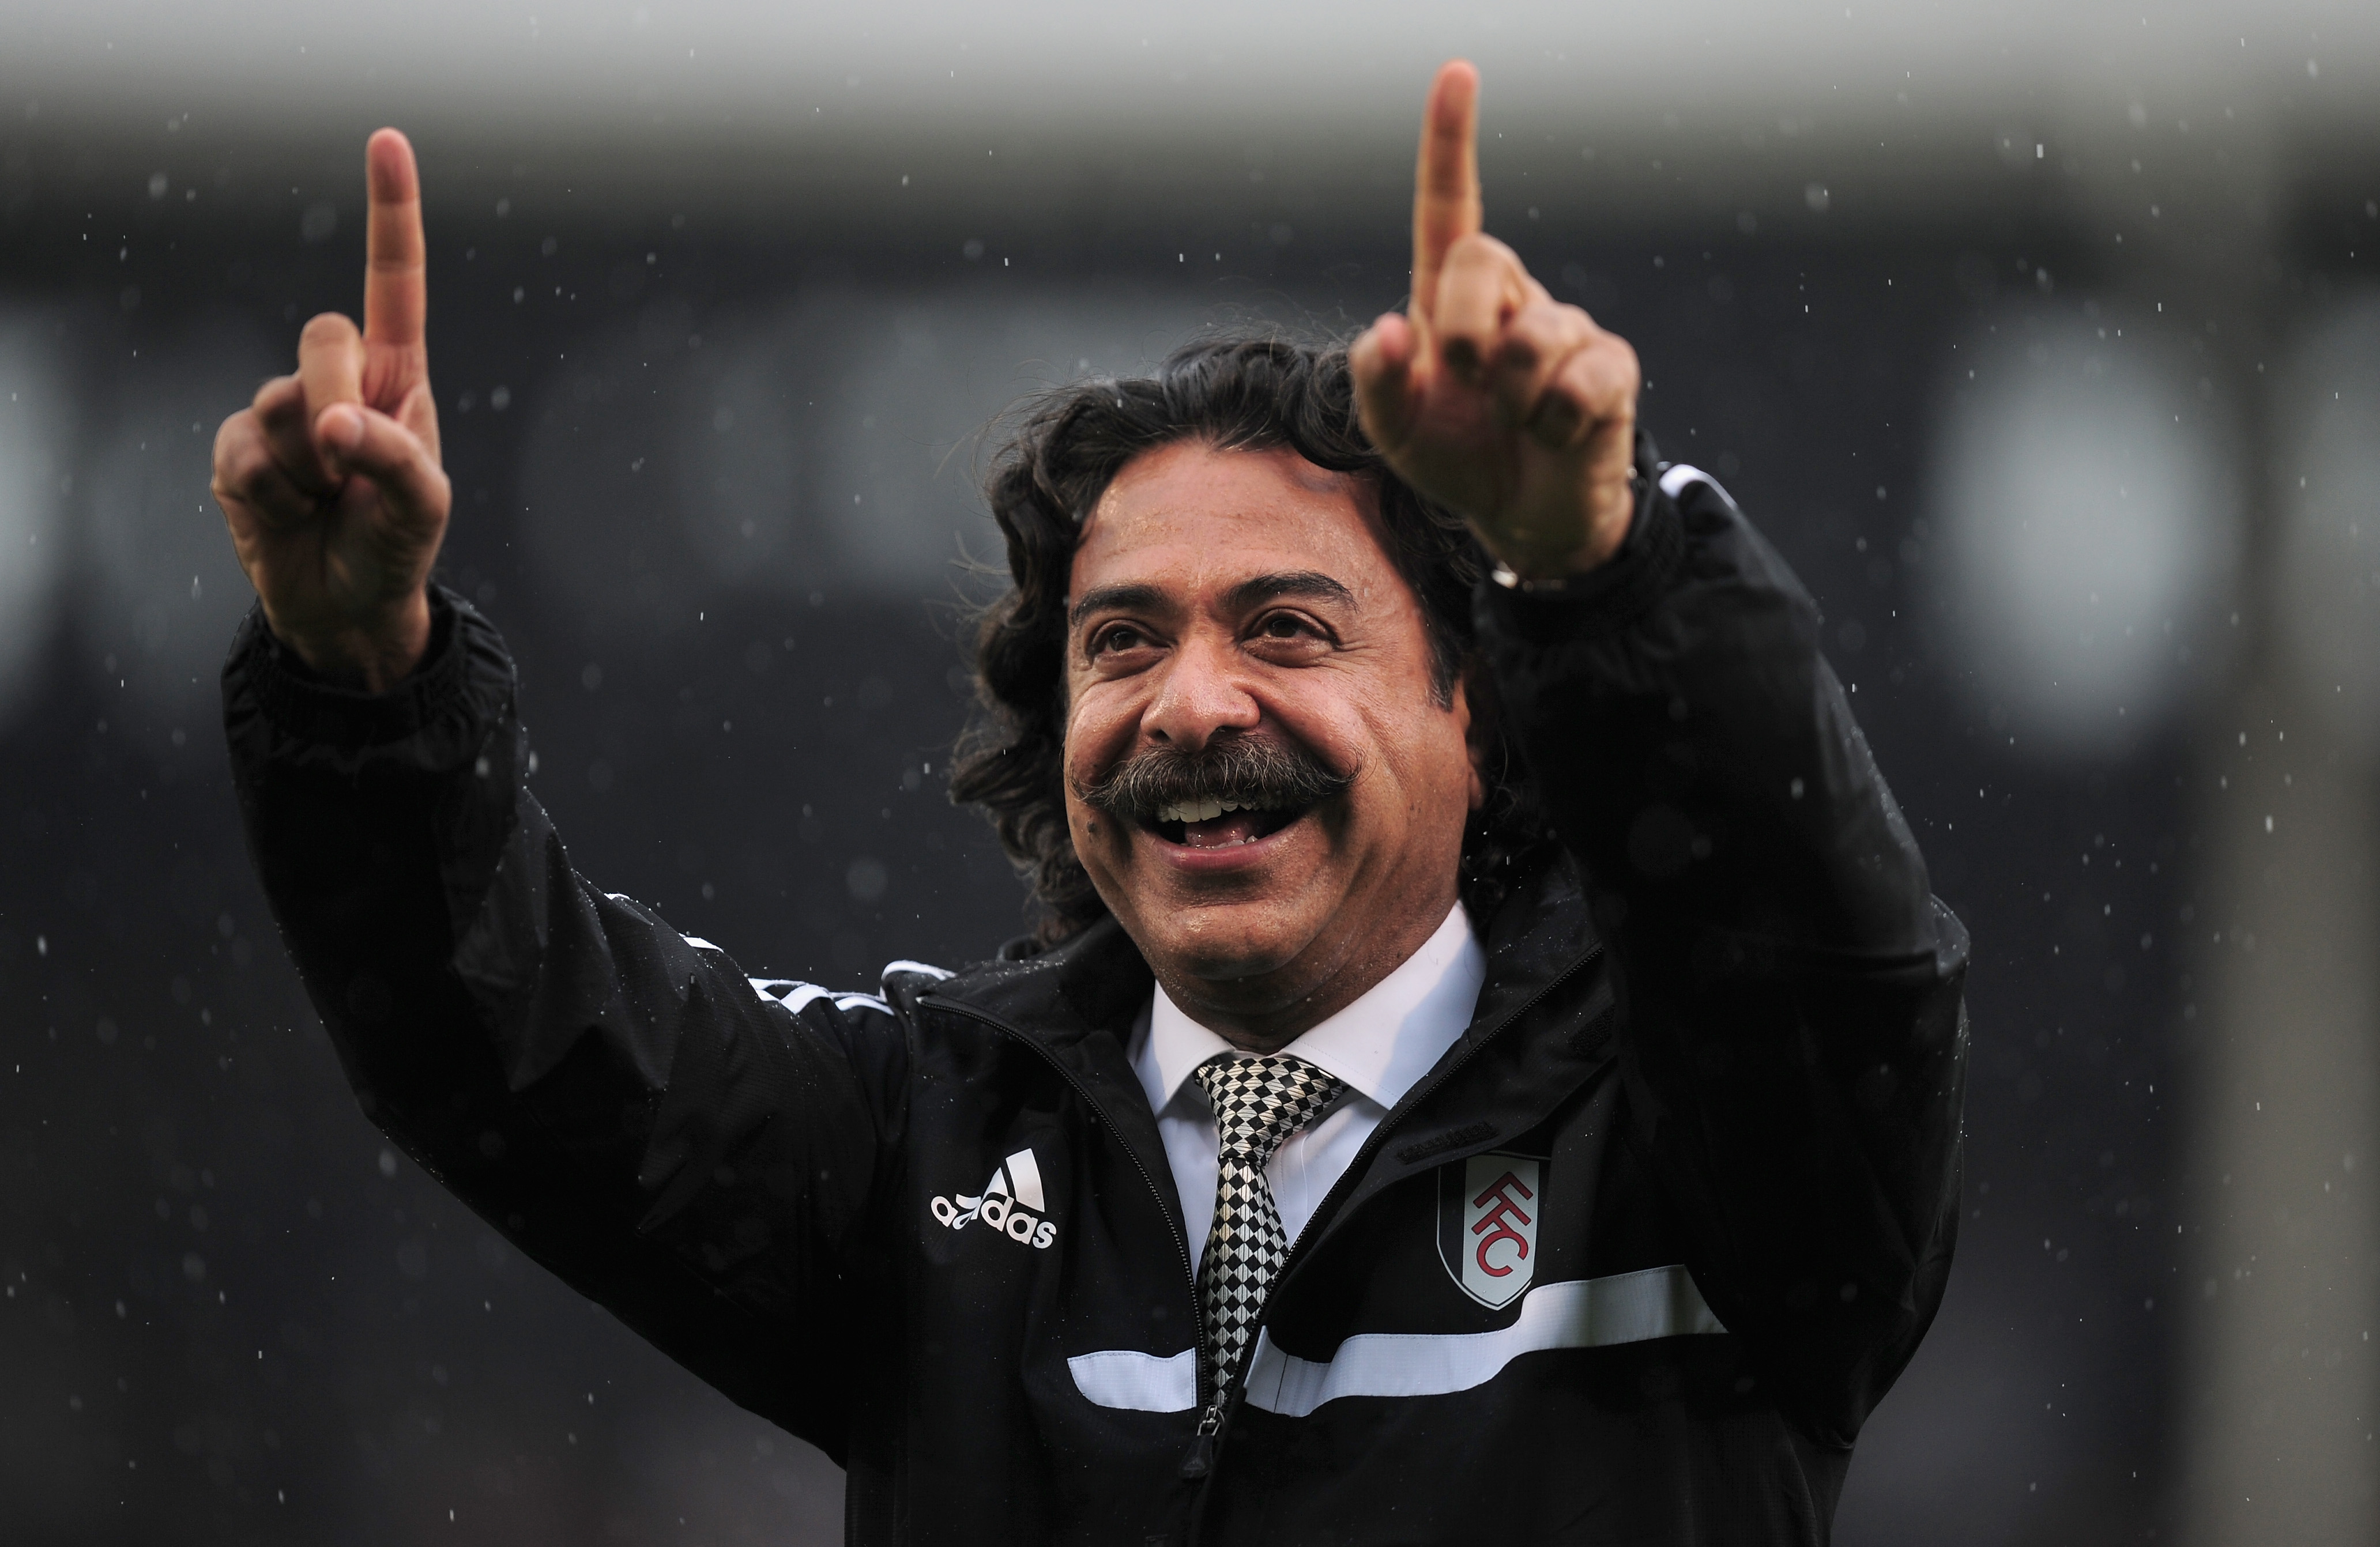 Fulham owner Shahid Khan